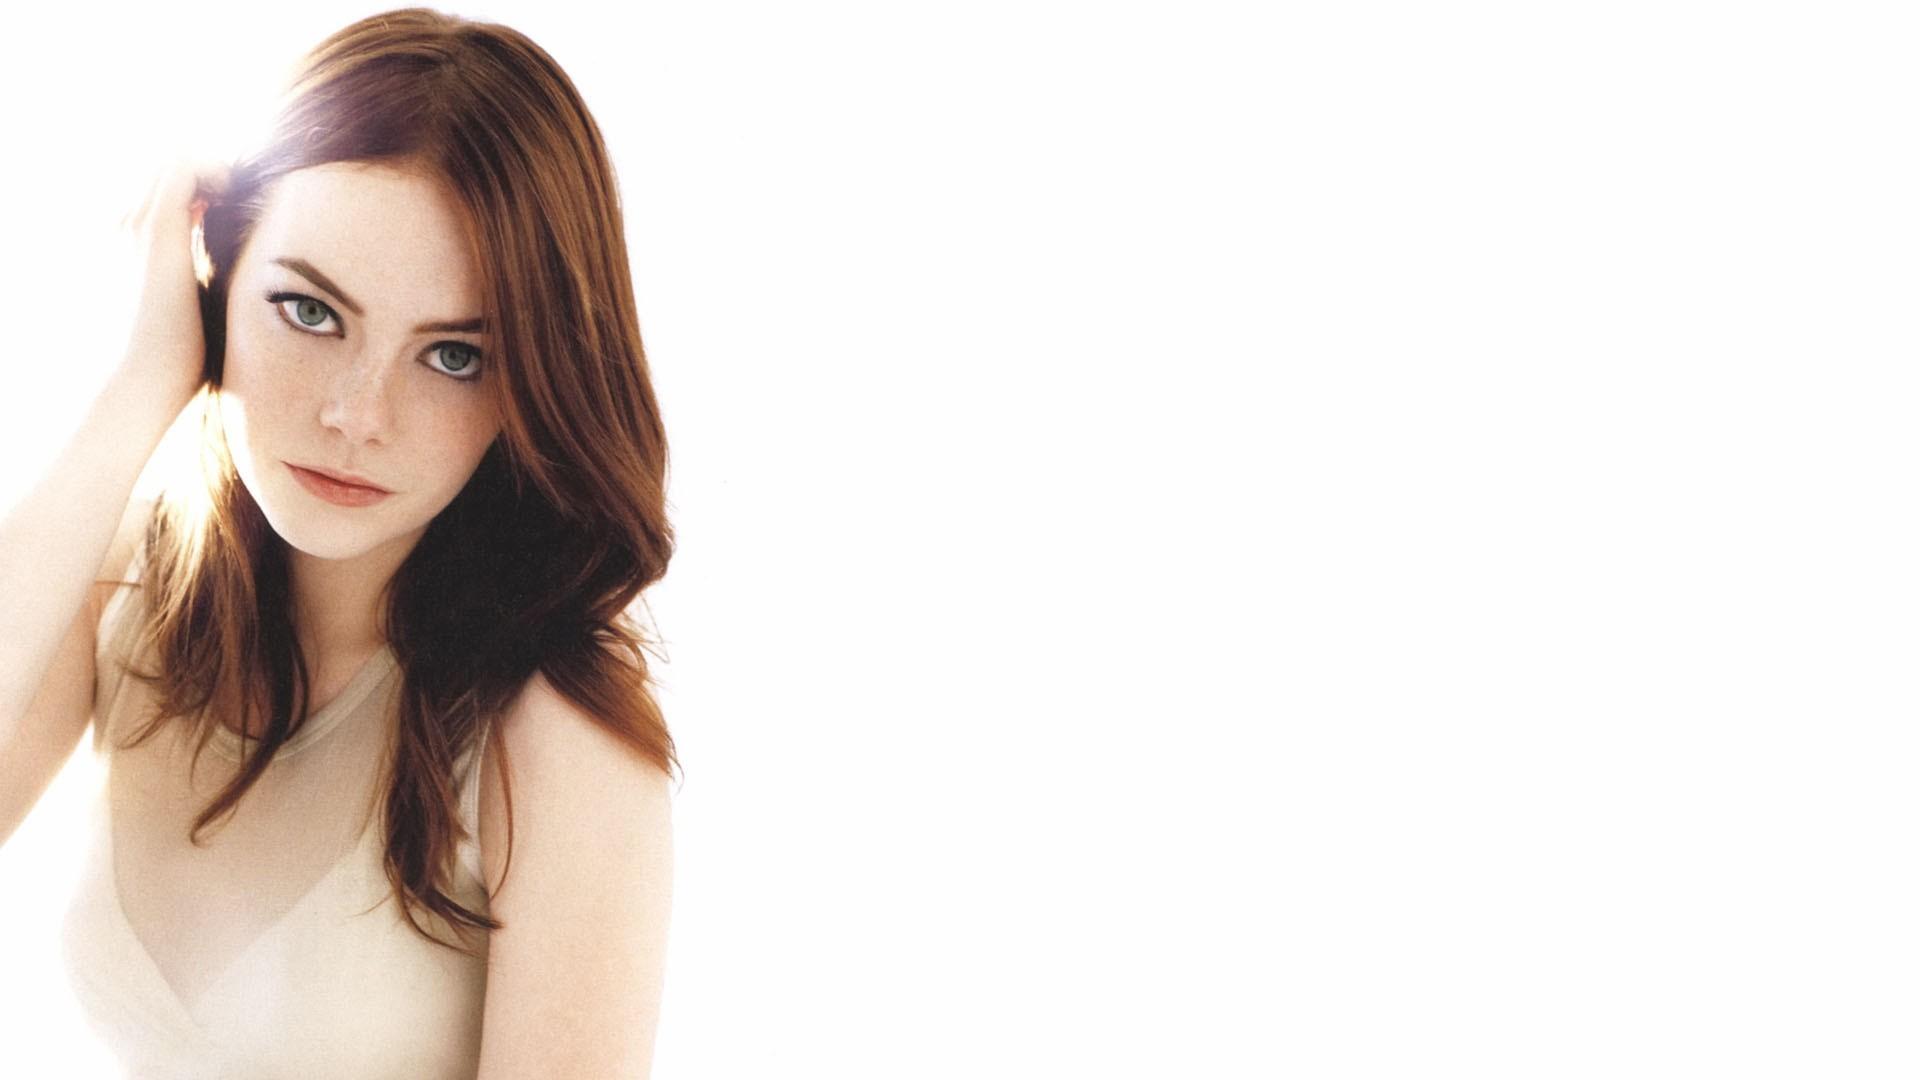 Emma Stone Hd Wallpaper Wallpapersafari